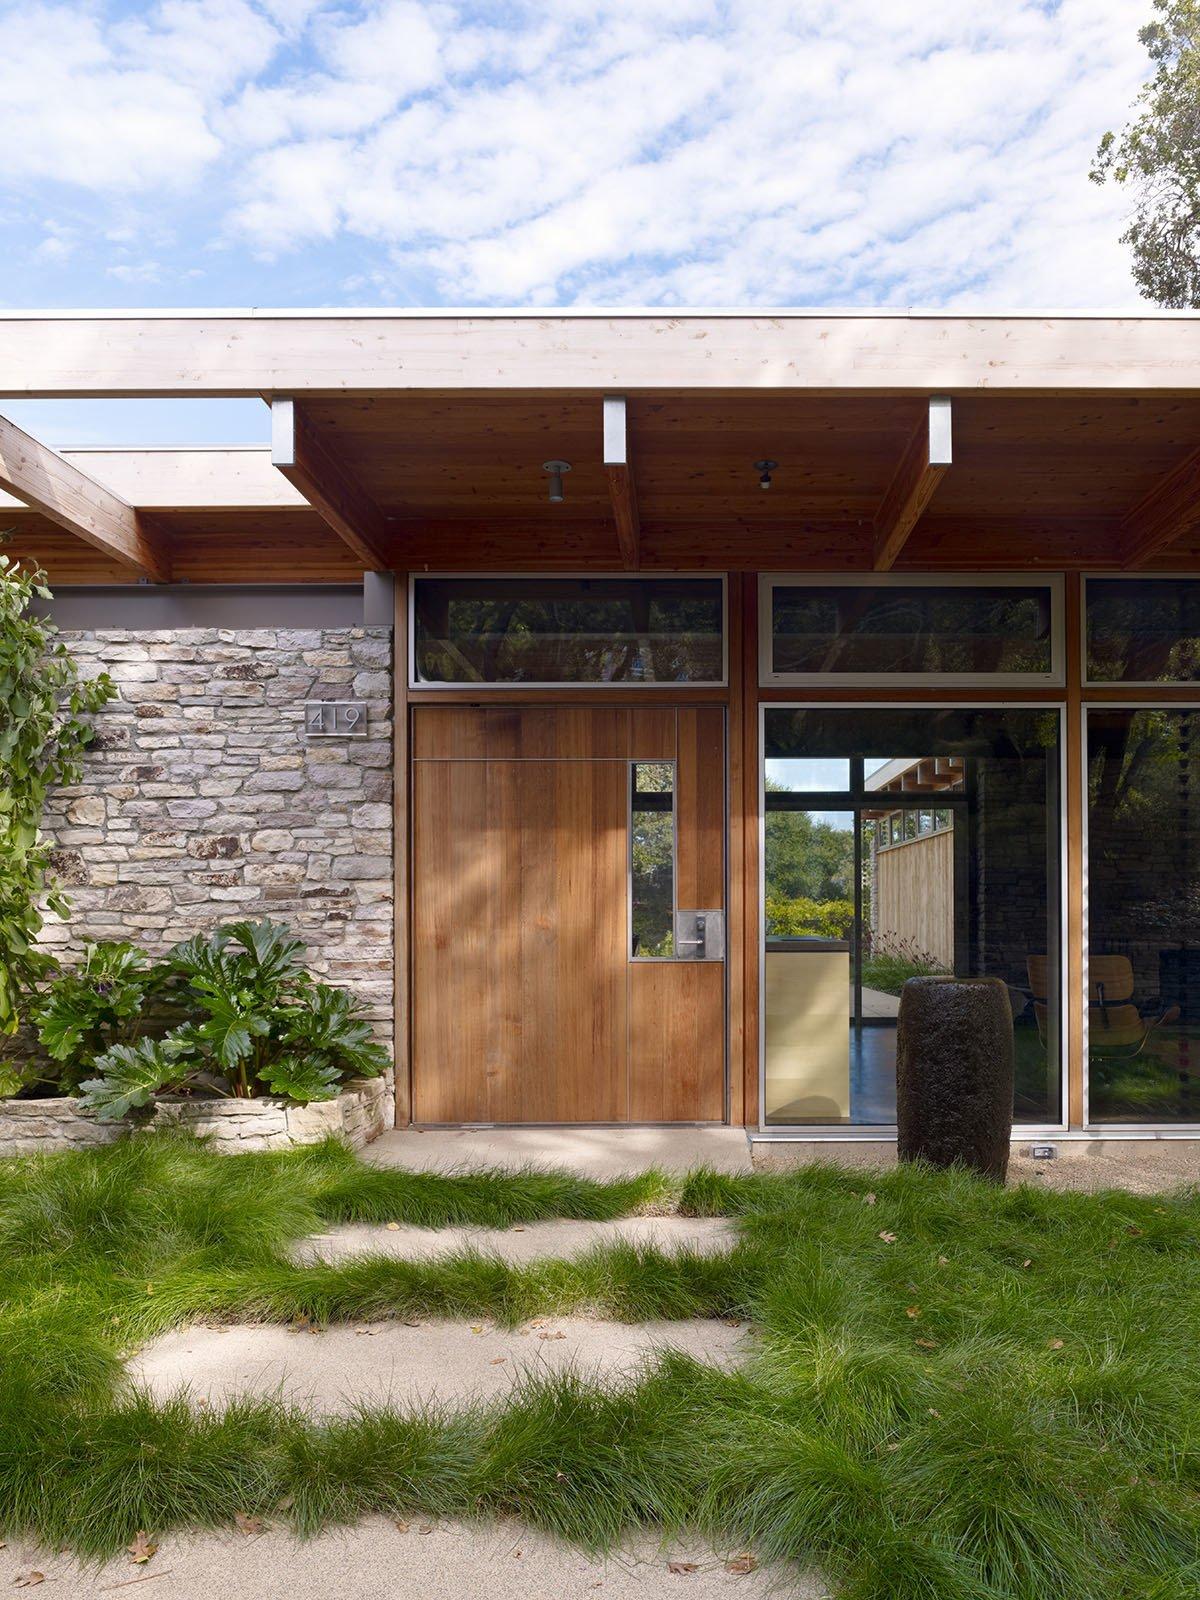 Pfau-Starr Residence by Pfau Long Architecture